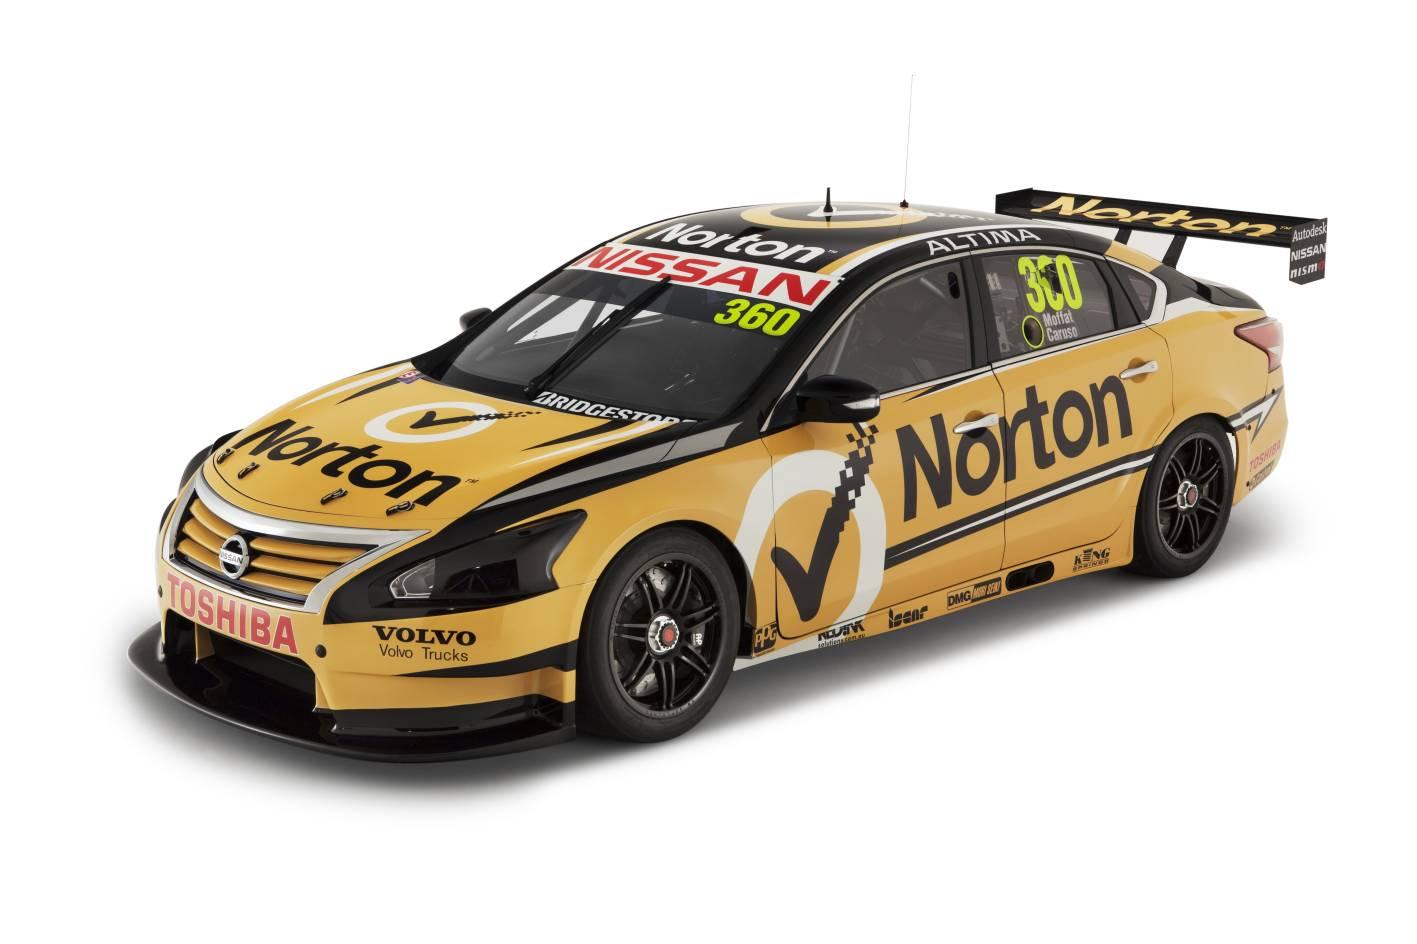 2013 Norton Nissan Altima V8 Supercar Front